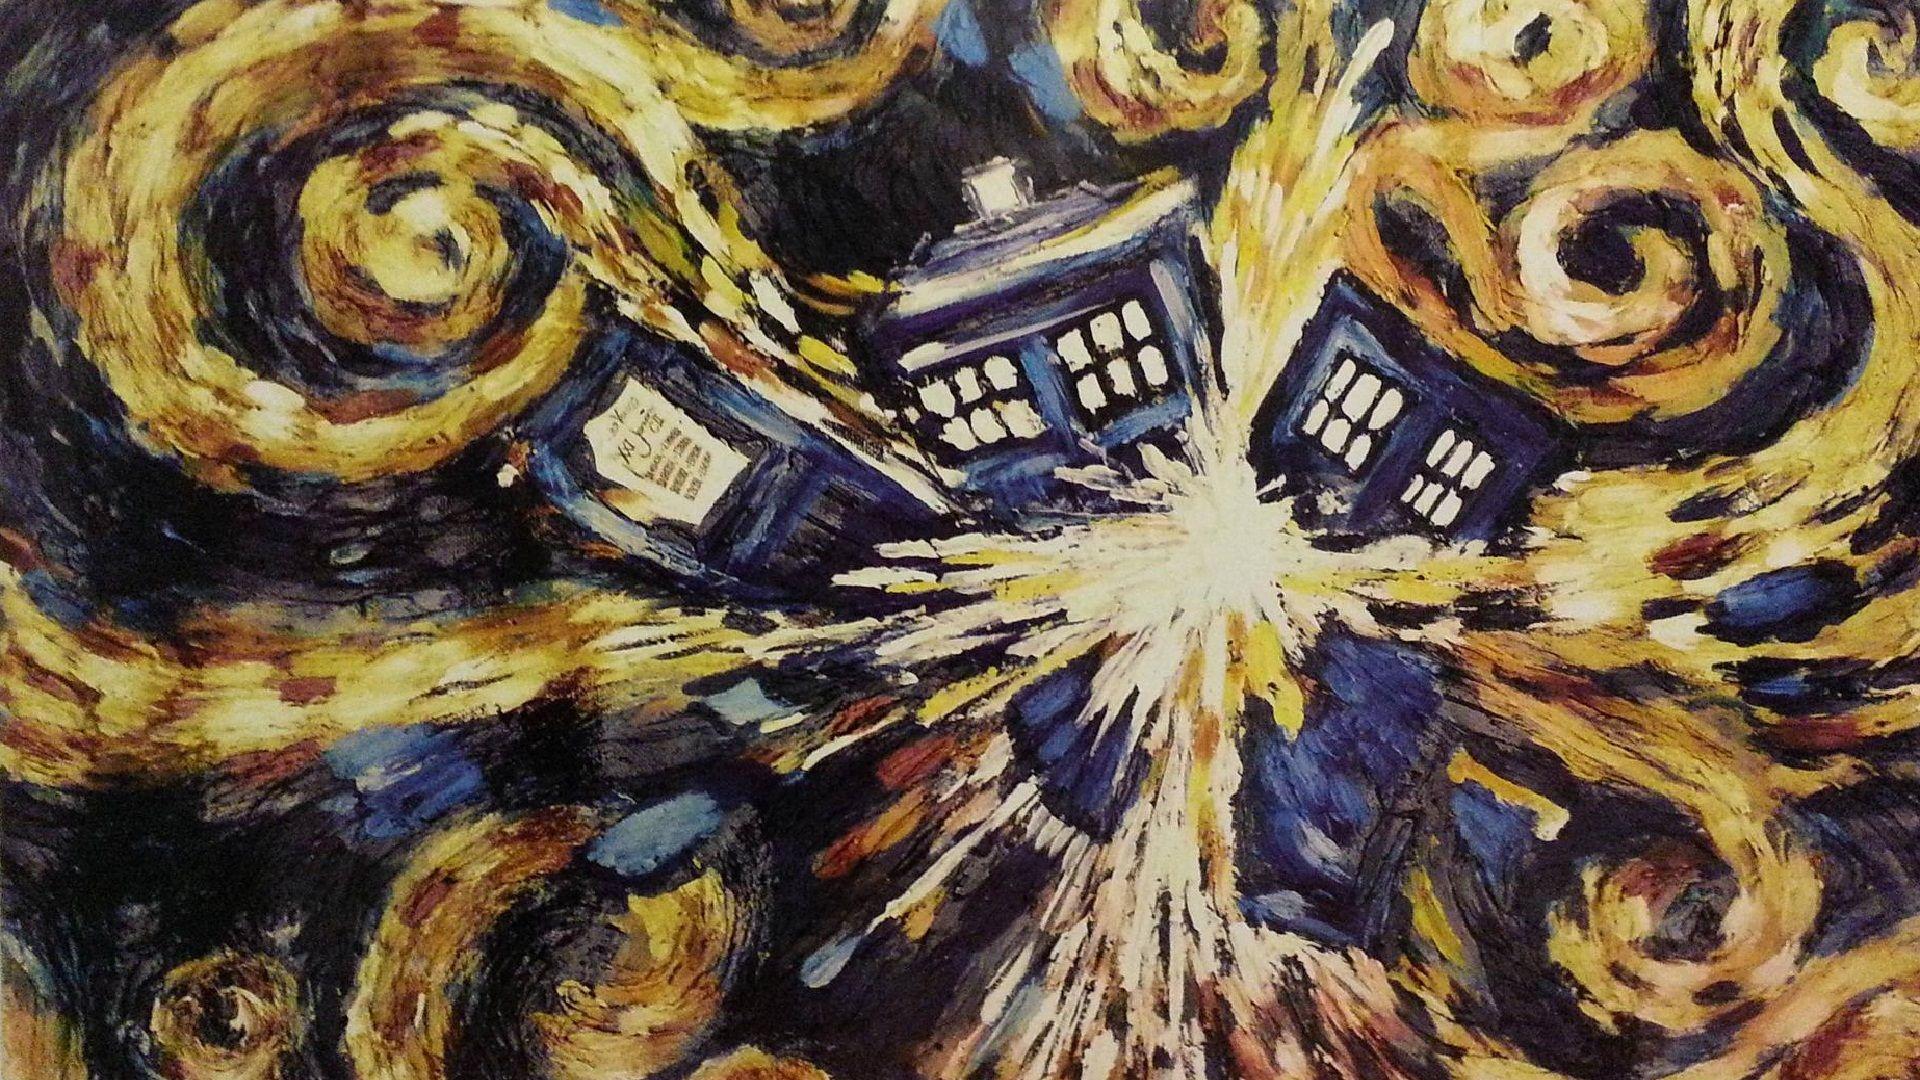 Dr. Who Exploding Tardis Desktop Backgrounds